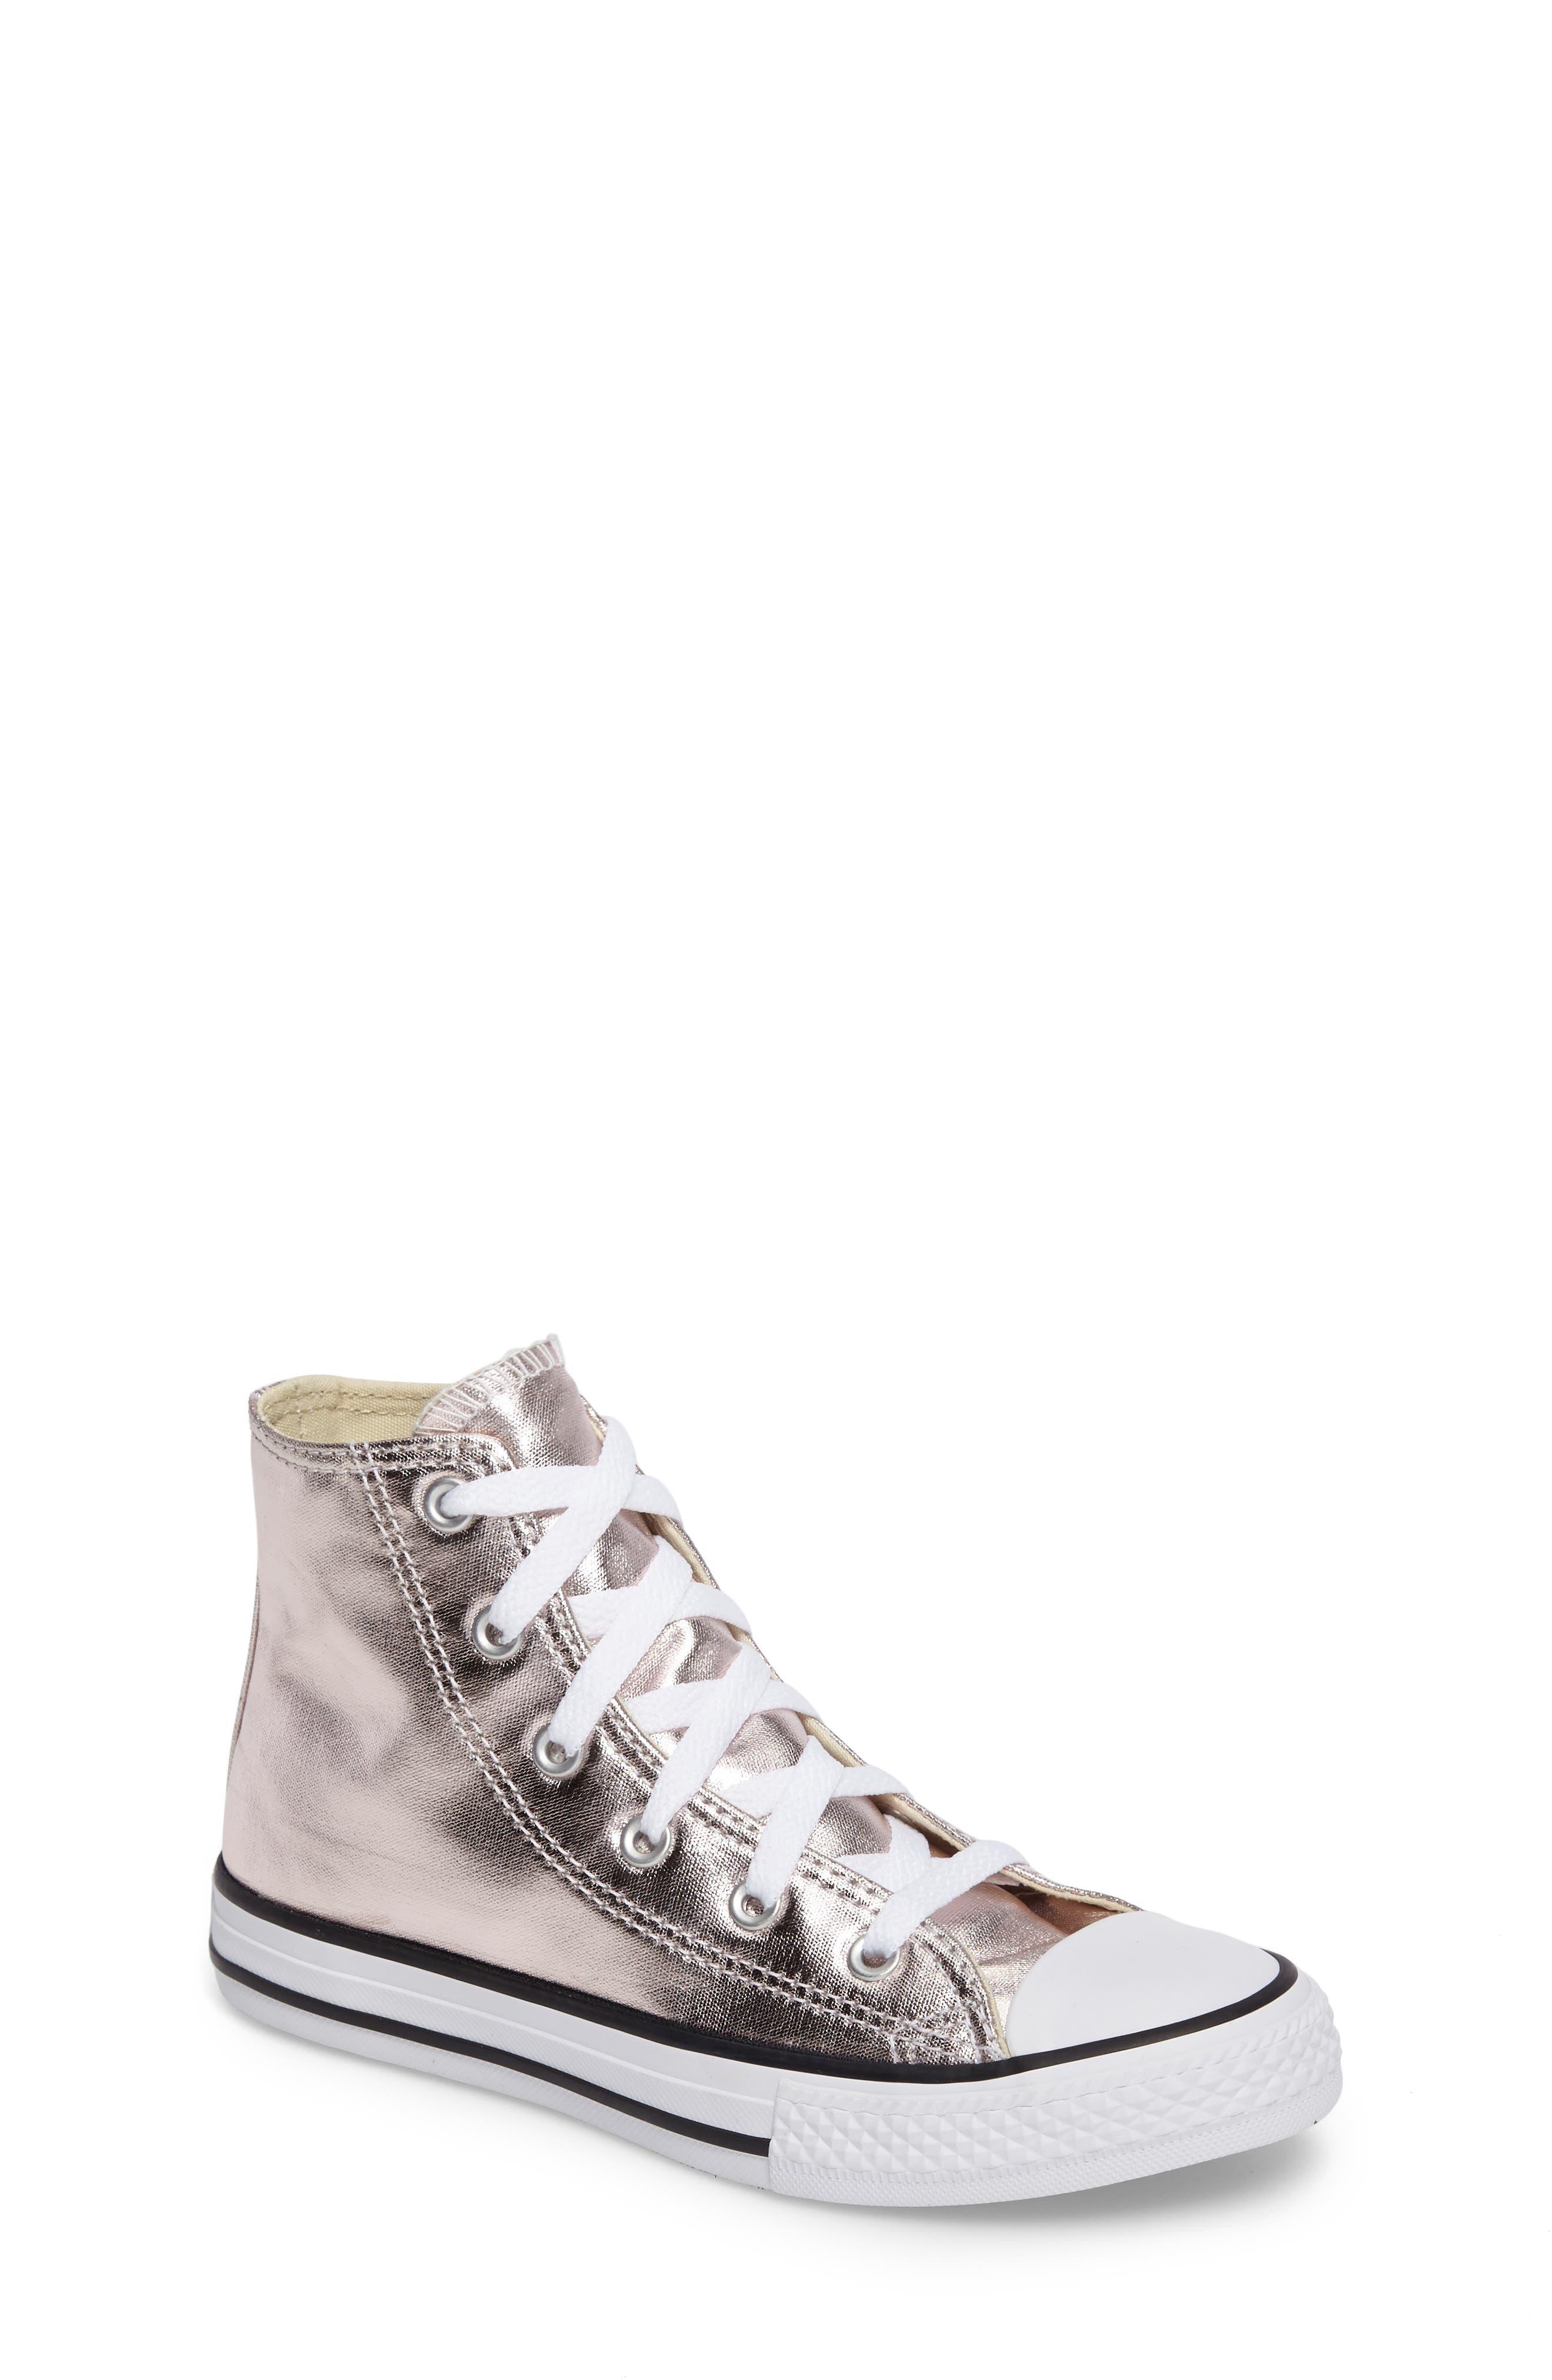 Chuck Taylor<sup>®</sup> All Star<sup>®</sup> Seasonal Metallic High Top Sneaker,                         Main,                         color, 221